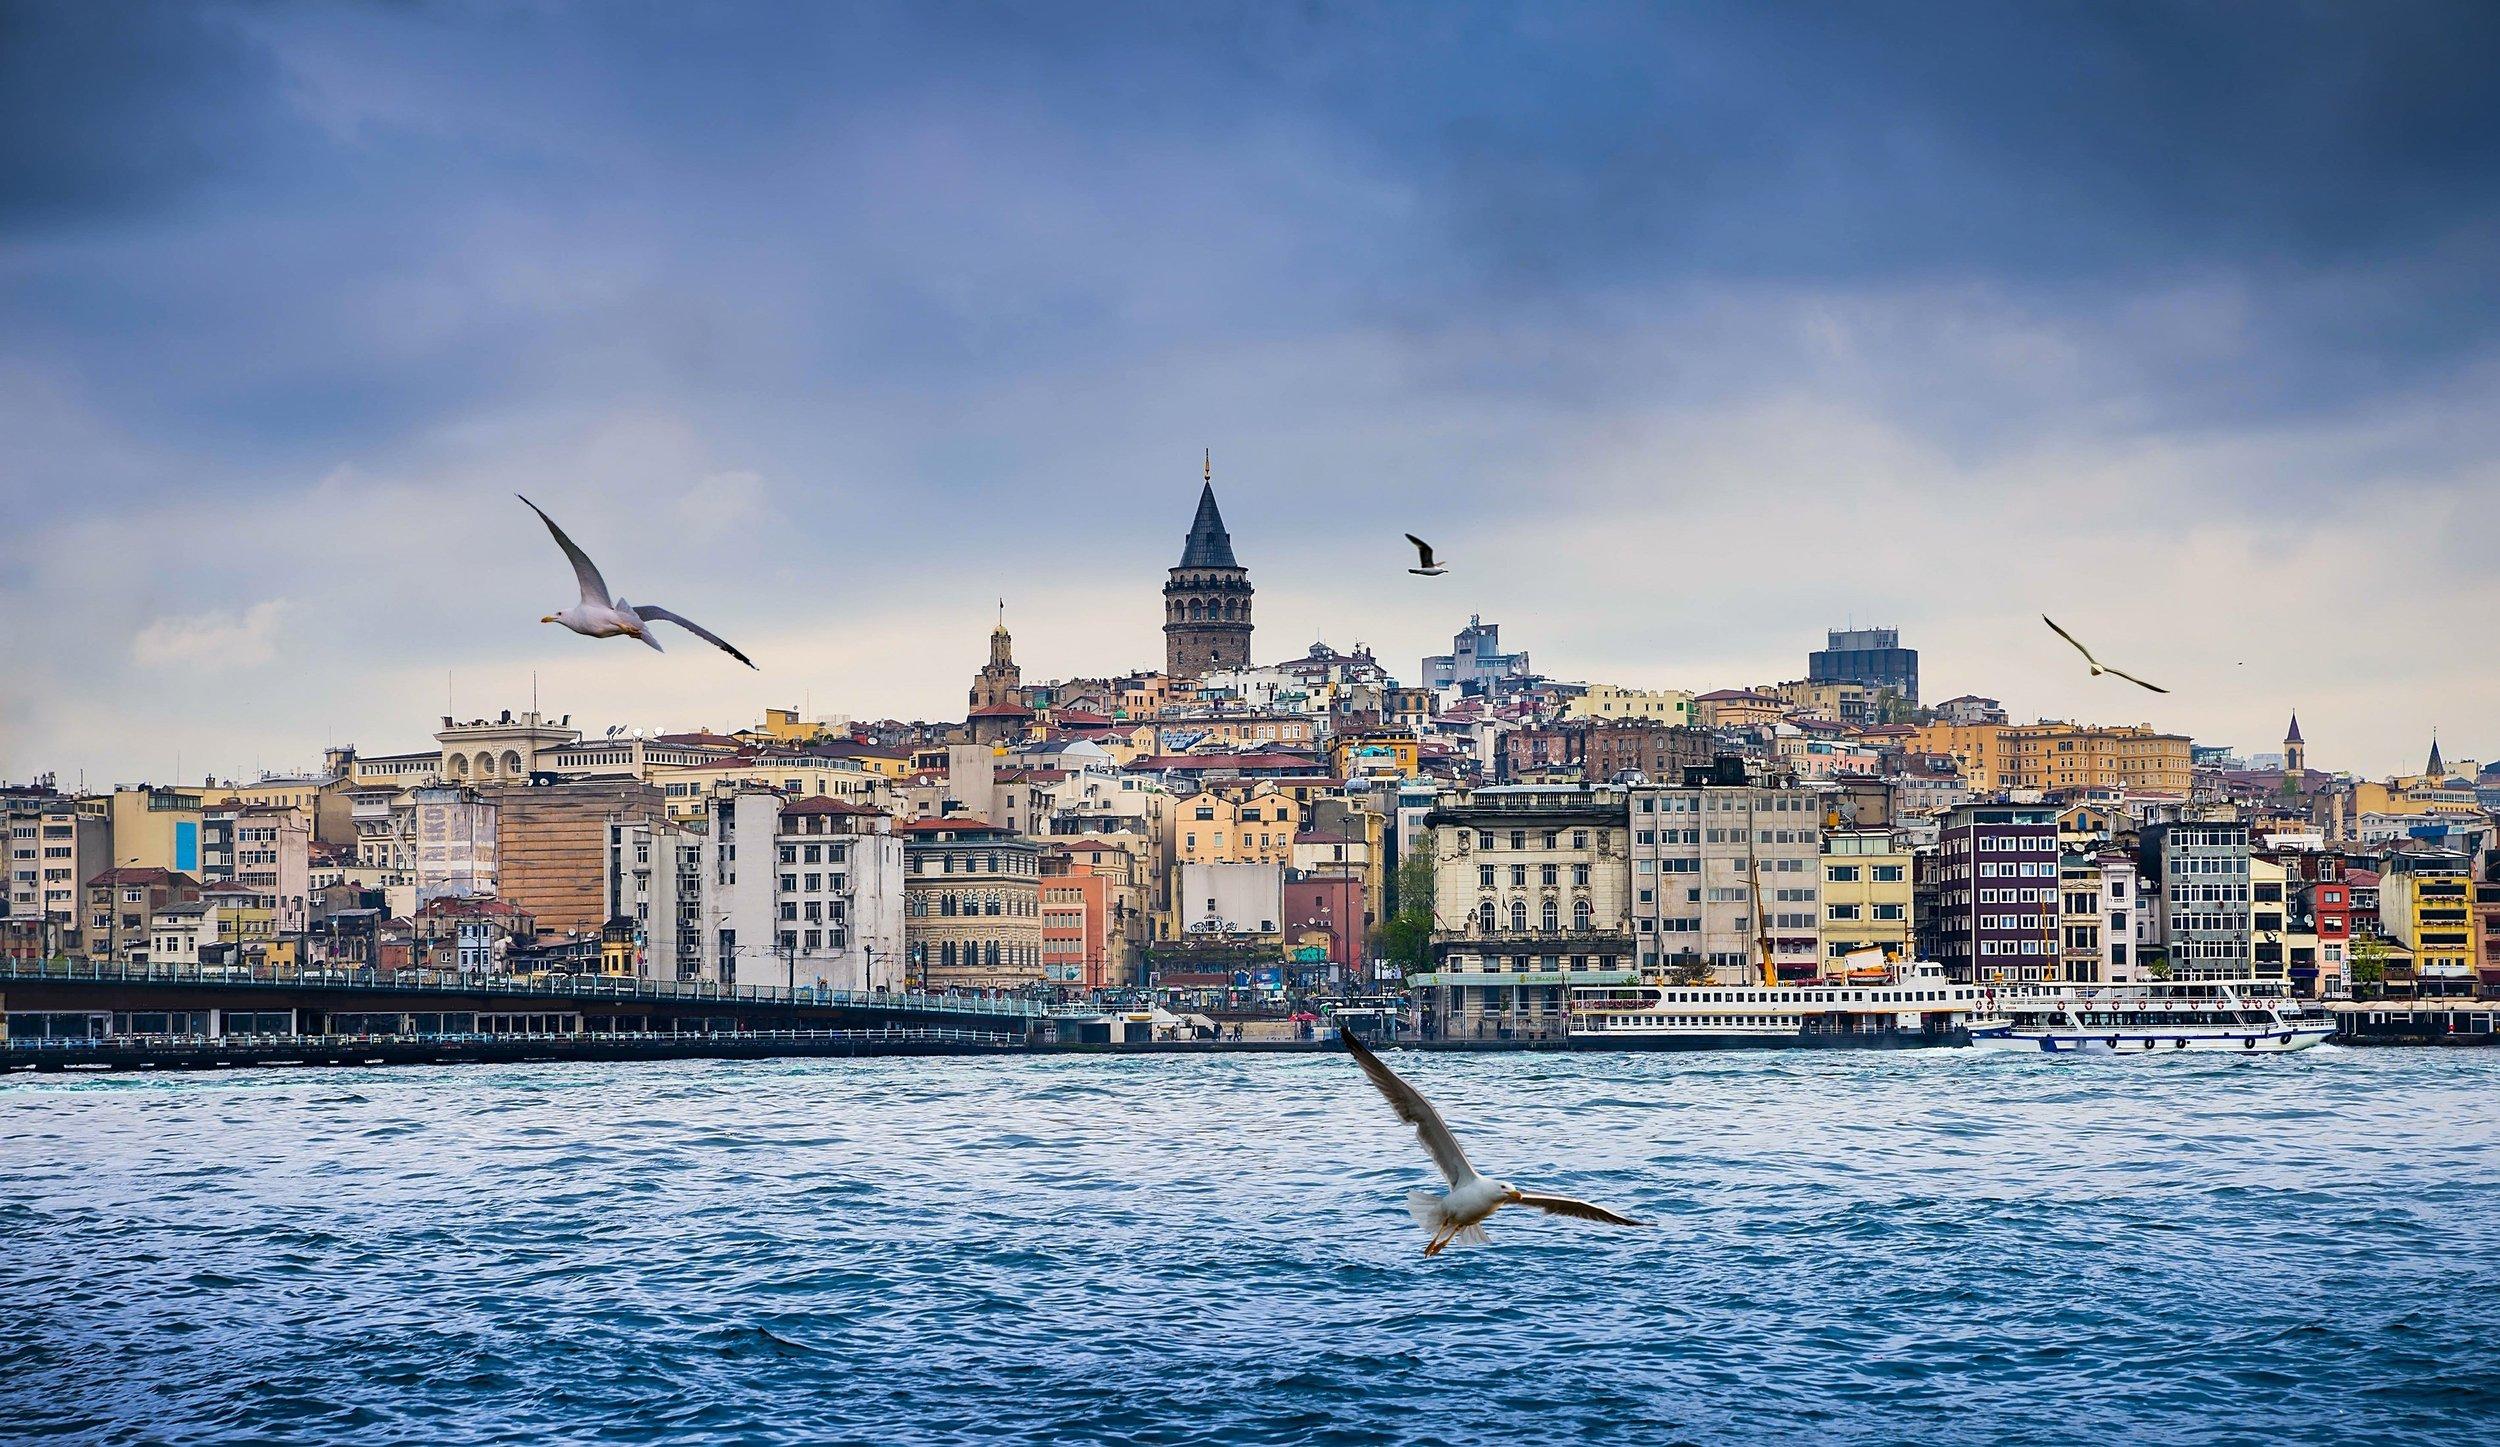 Istanbul pic.jpg